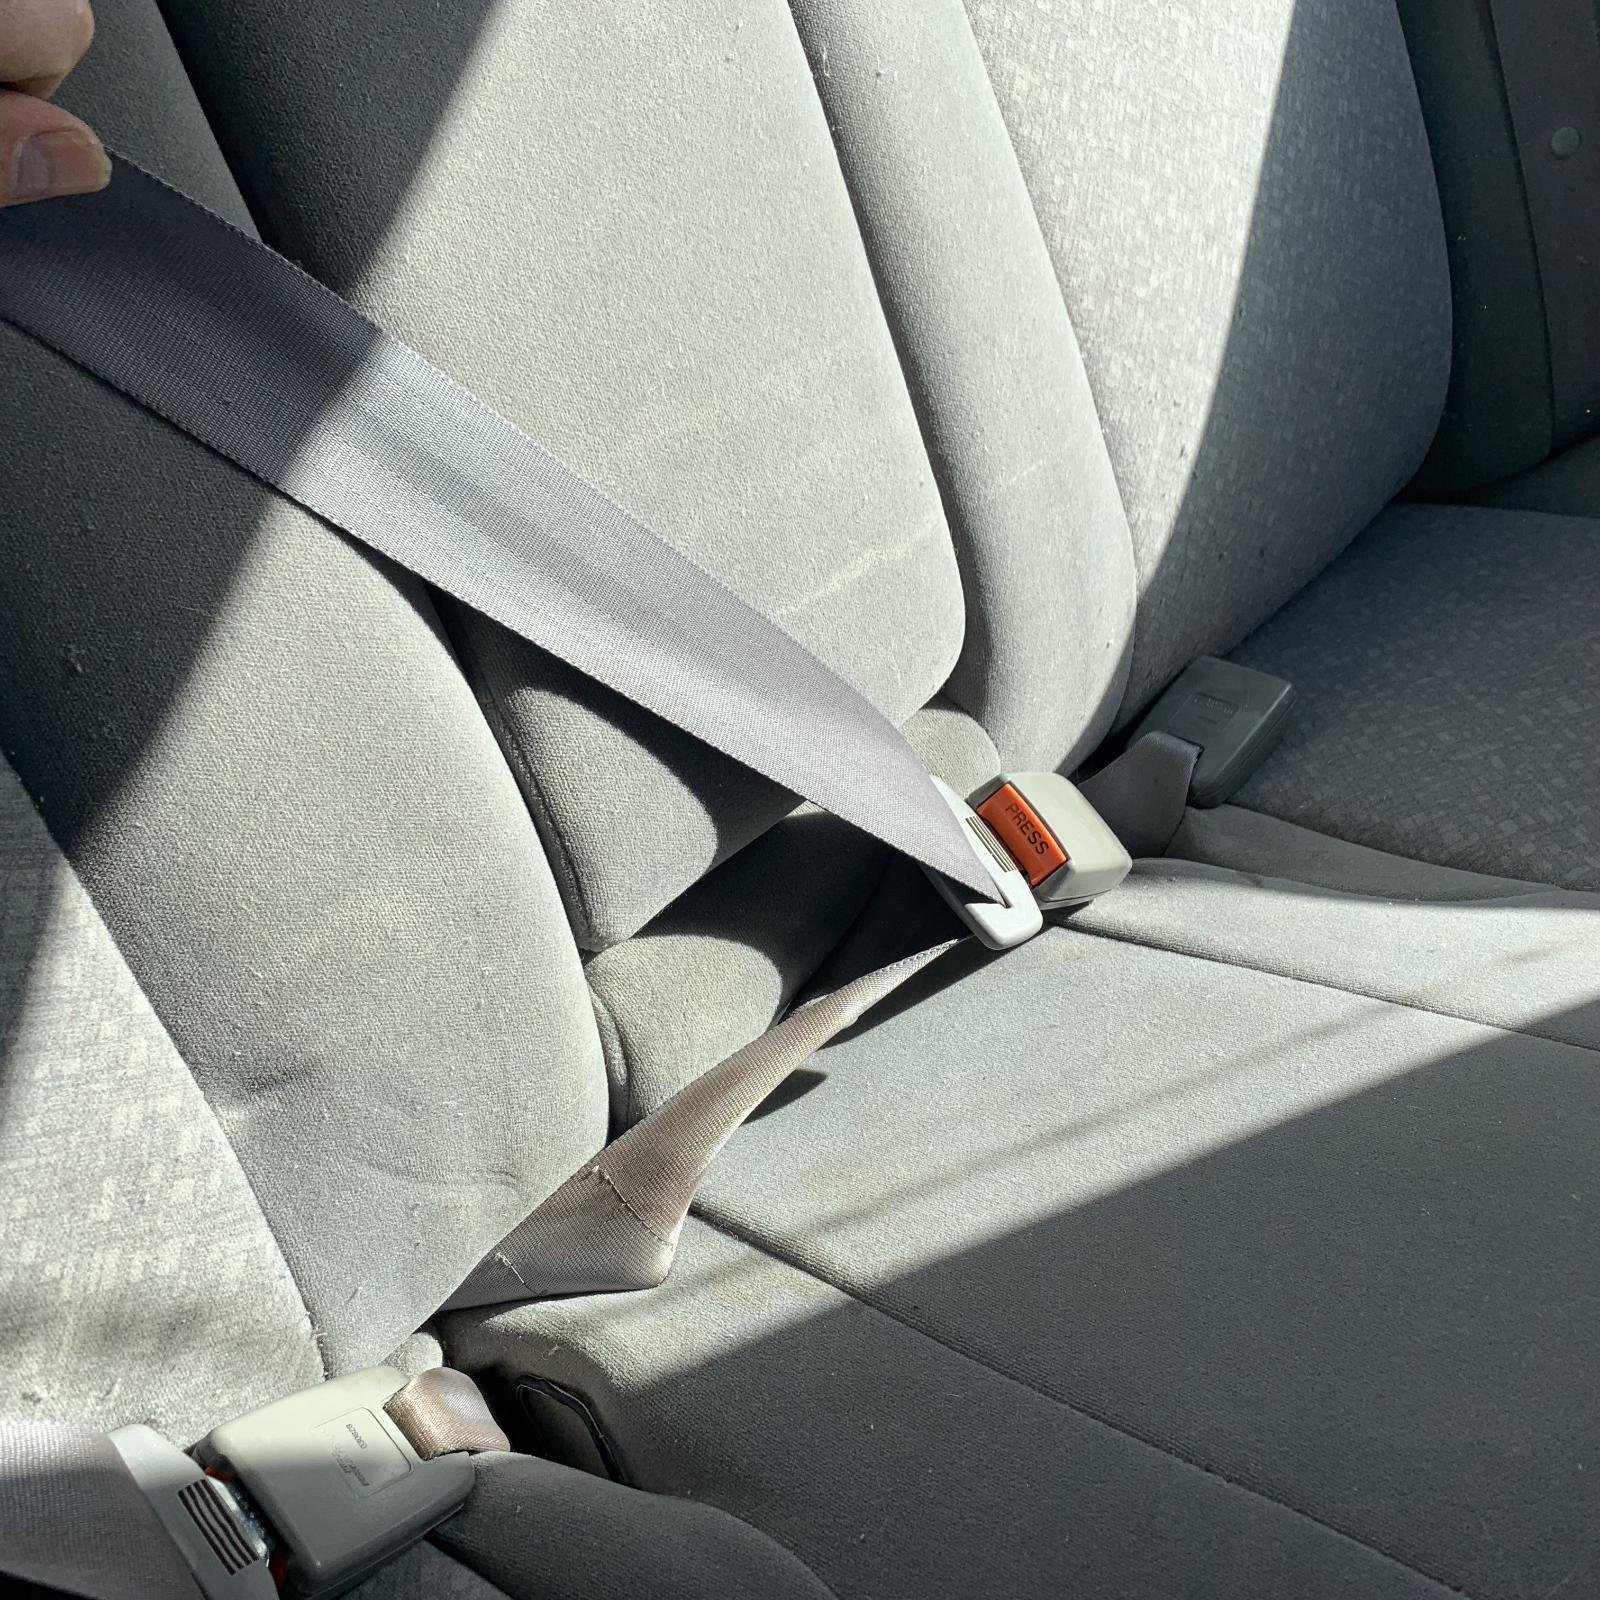 TOYOTA CAMRY, Seatbelt/Stalk, CENTRE REAR, SEAT BELT ONLY, SK36, 08/02-05/06